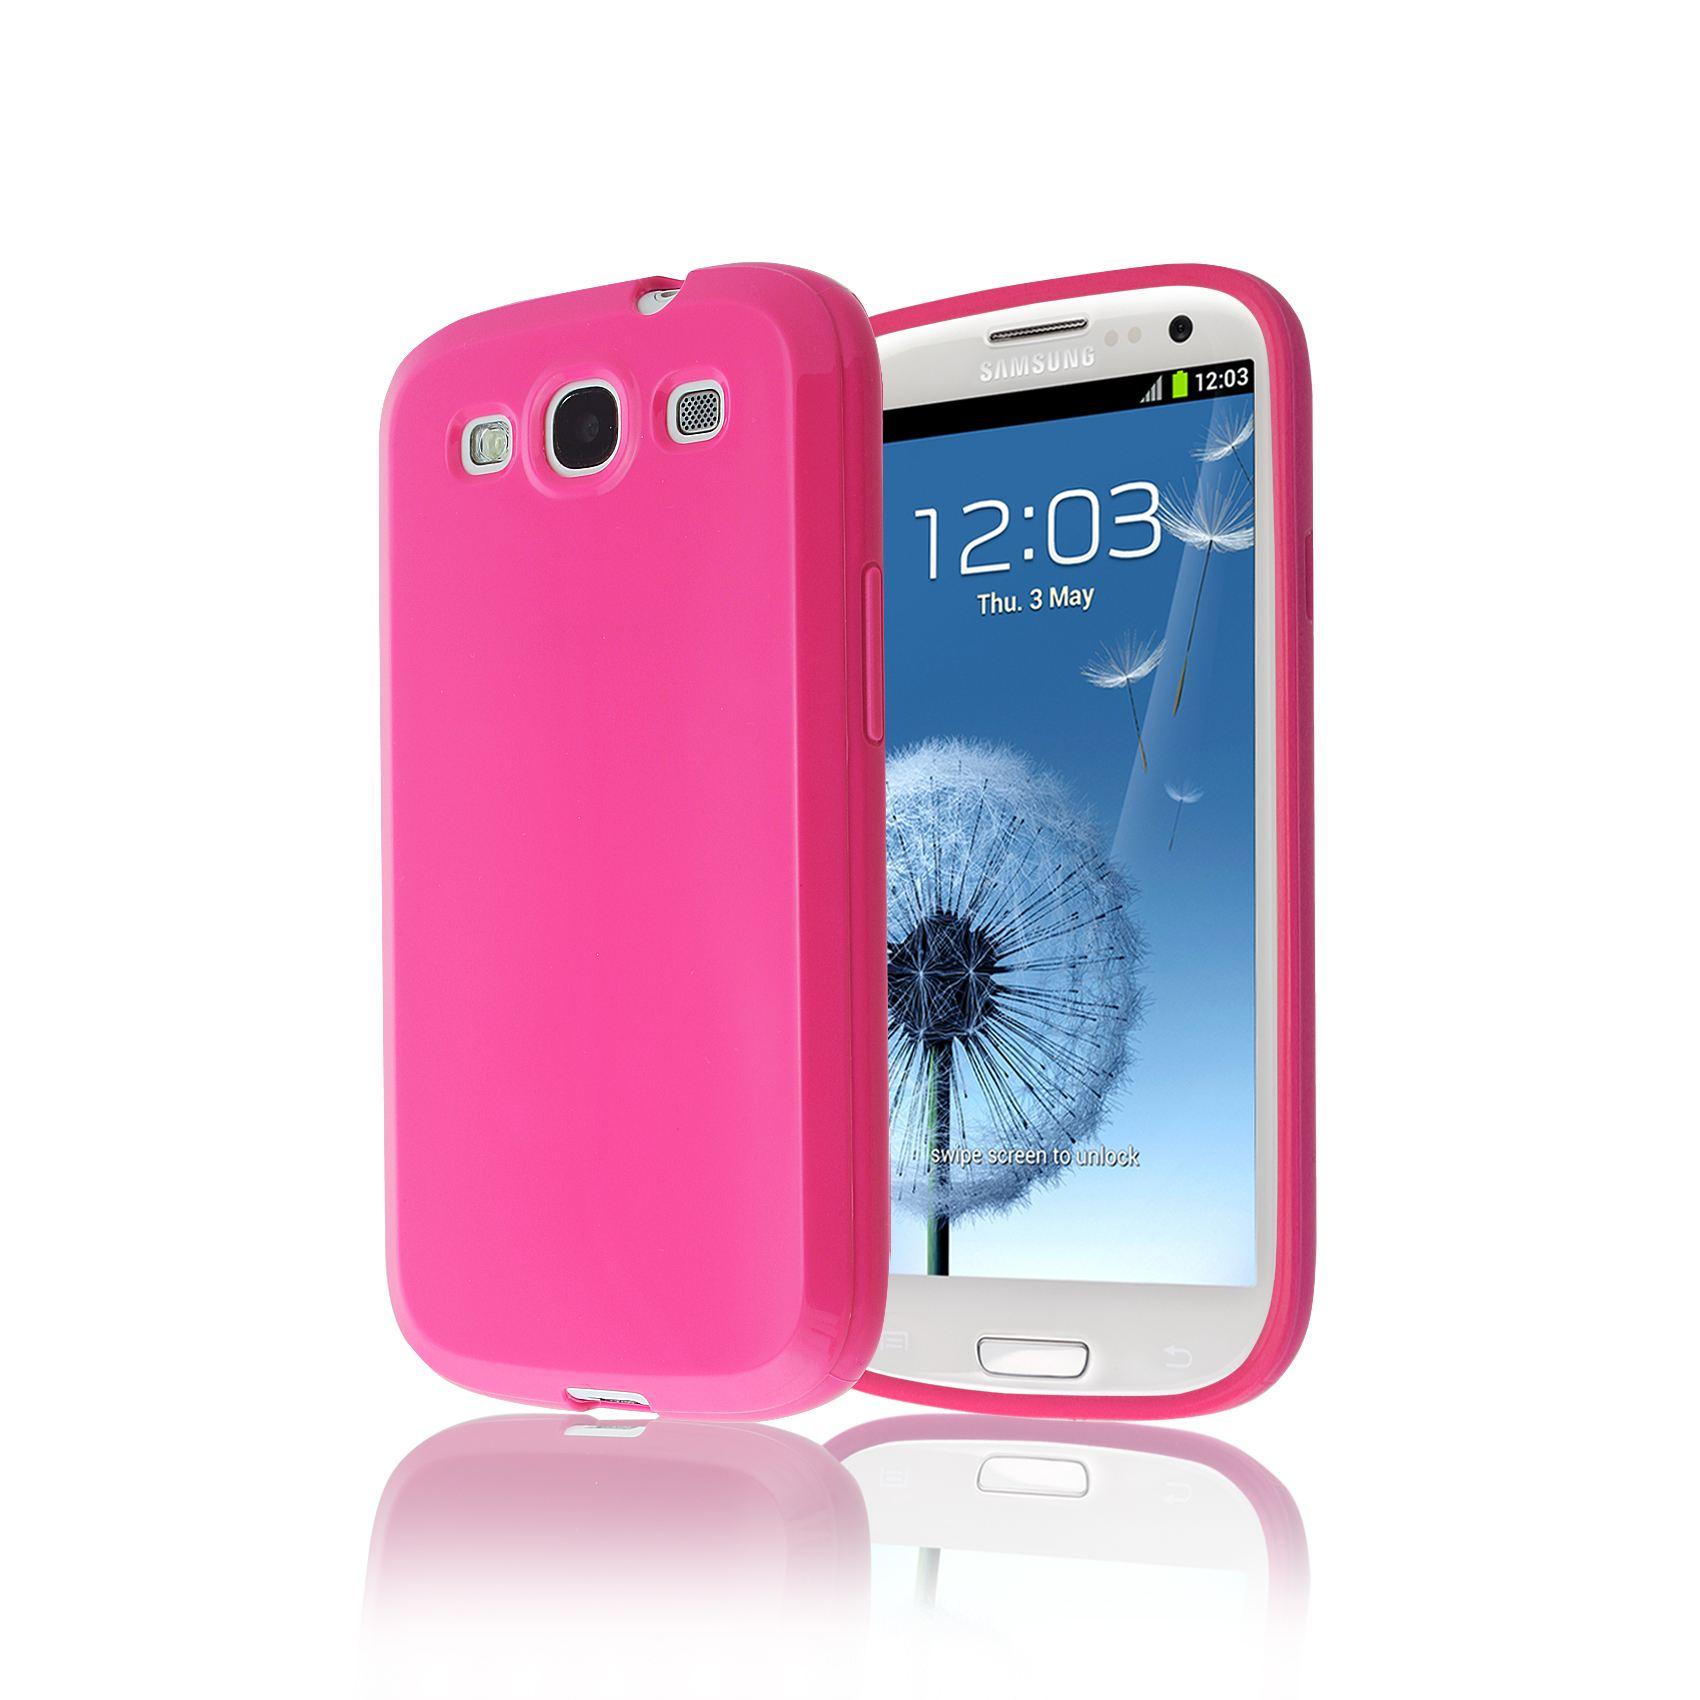 b7740cdde Silikonové pouzdro / obal na Samsung Galaxy S3 / S3 Neo (SGS3UK3)